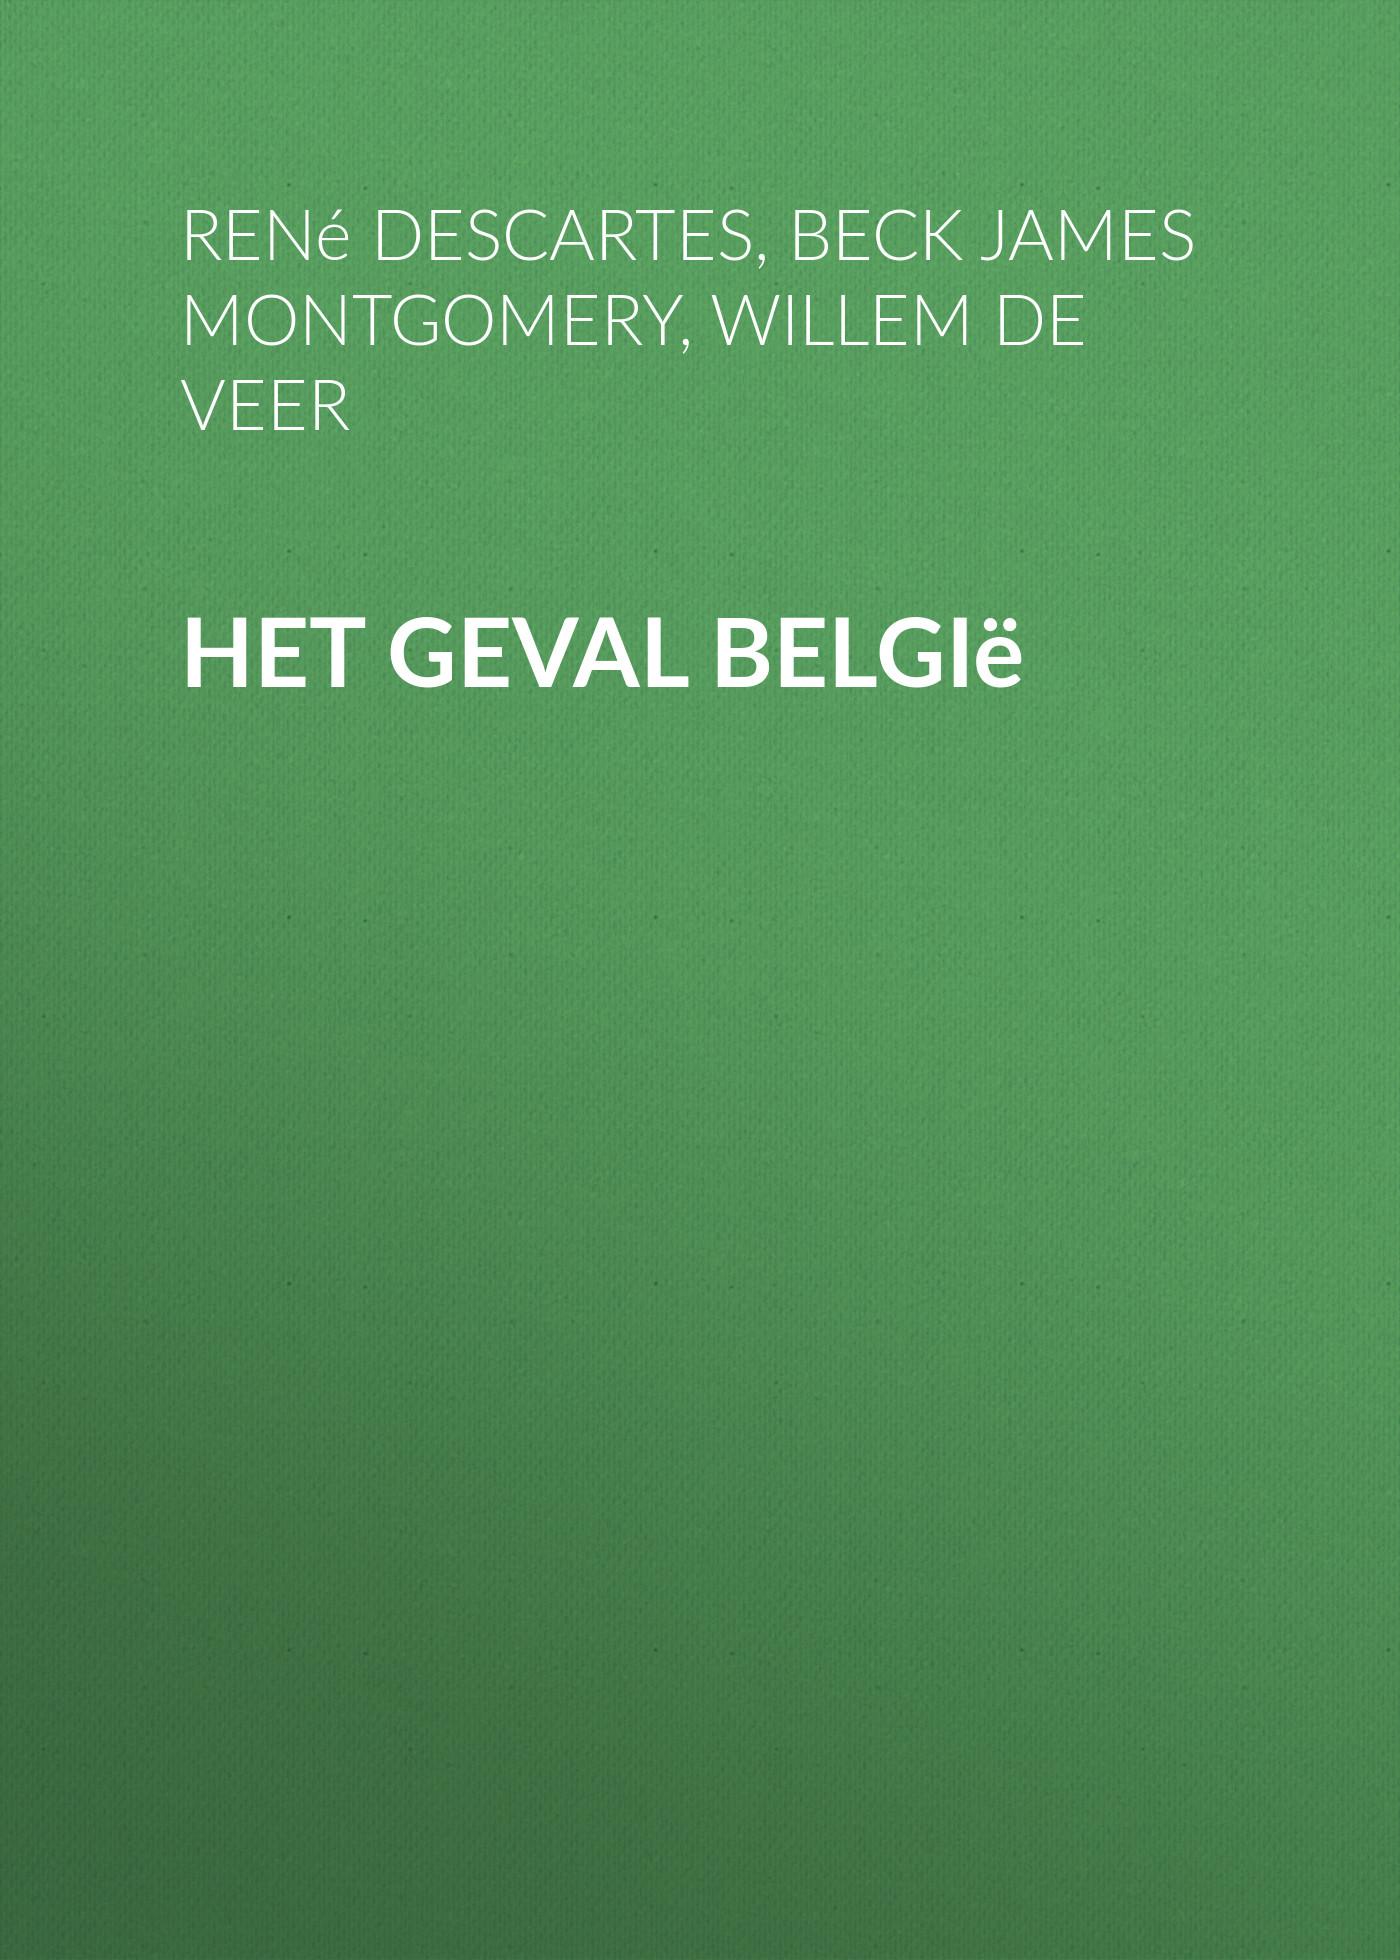 het geval belgie